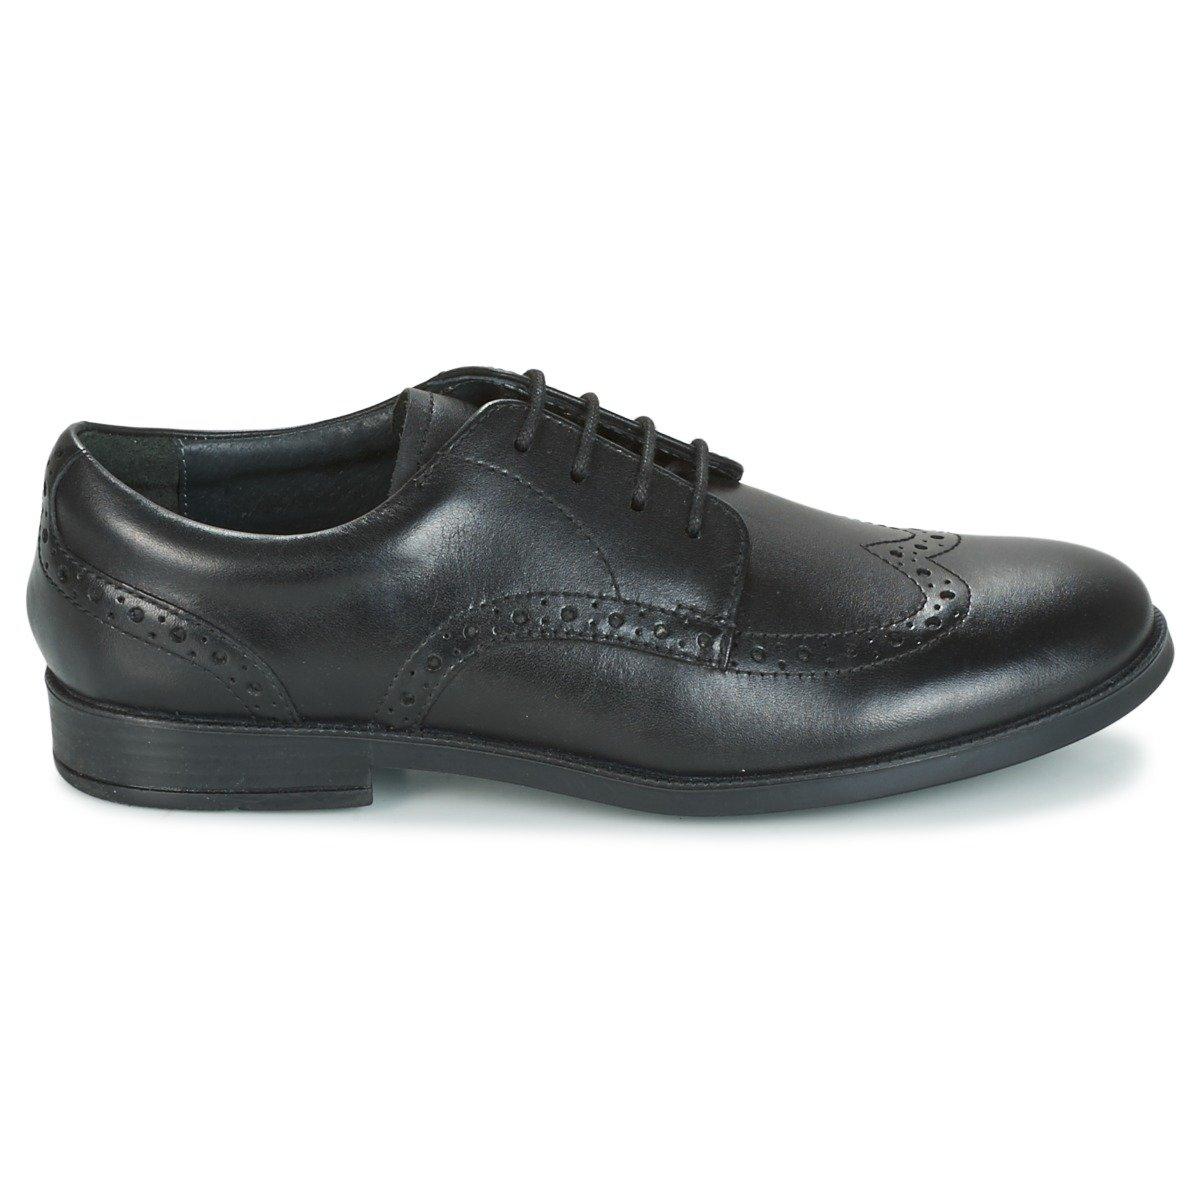 Startrite Boys Brogue Pri Kids School Shoes